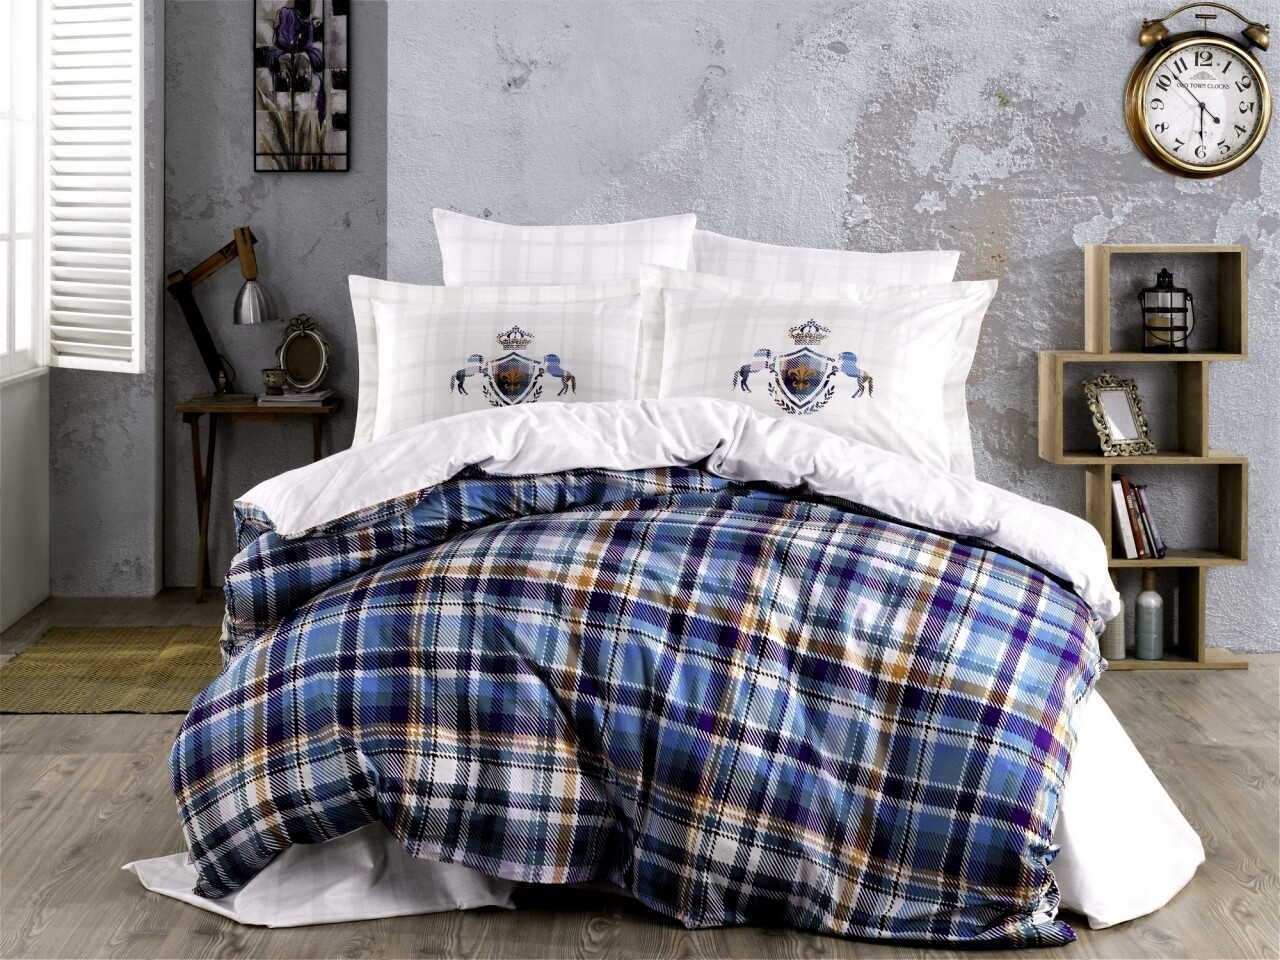 Lenjerie de pat pentru o persoana, 3 piese, 100% bumbac poplin, Hobby, Adalia Royal, multicolora